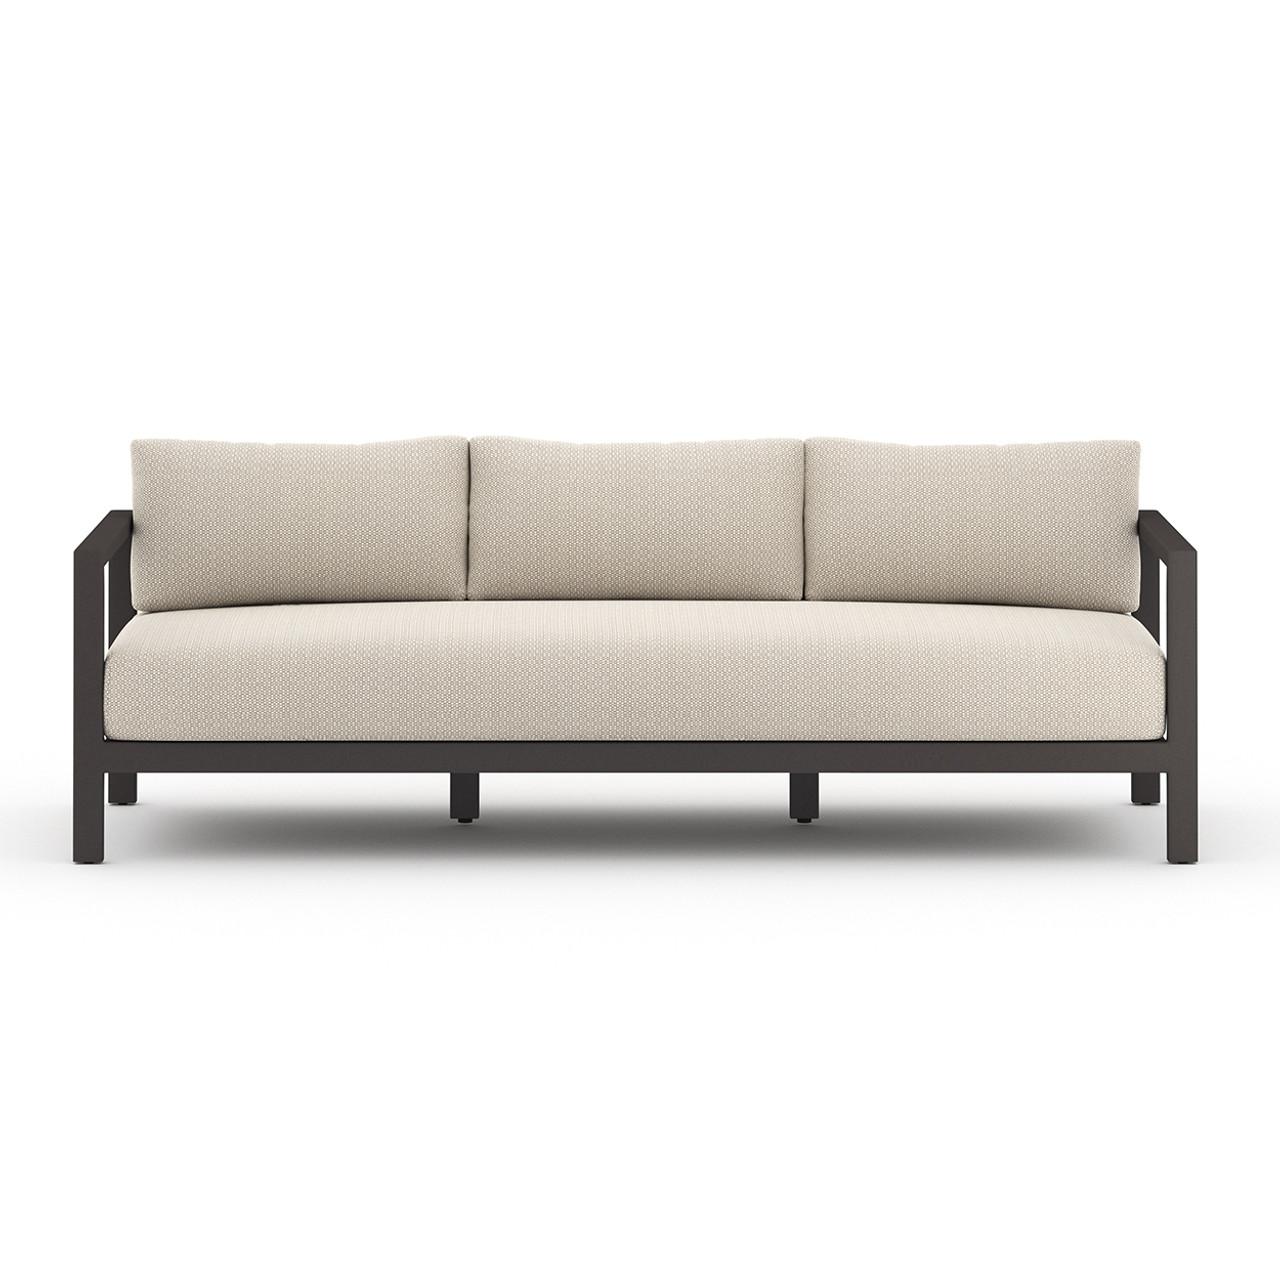 Oceanside Outdoor Sofa Collection - Black Bronze